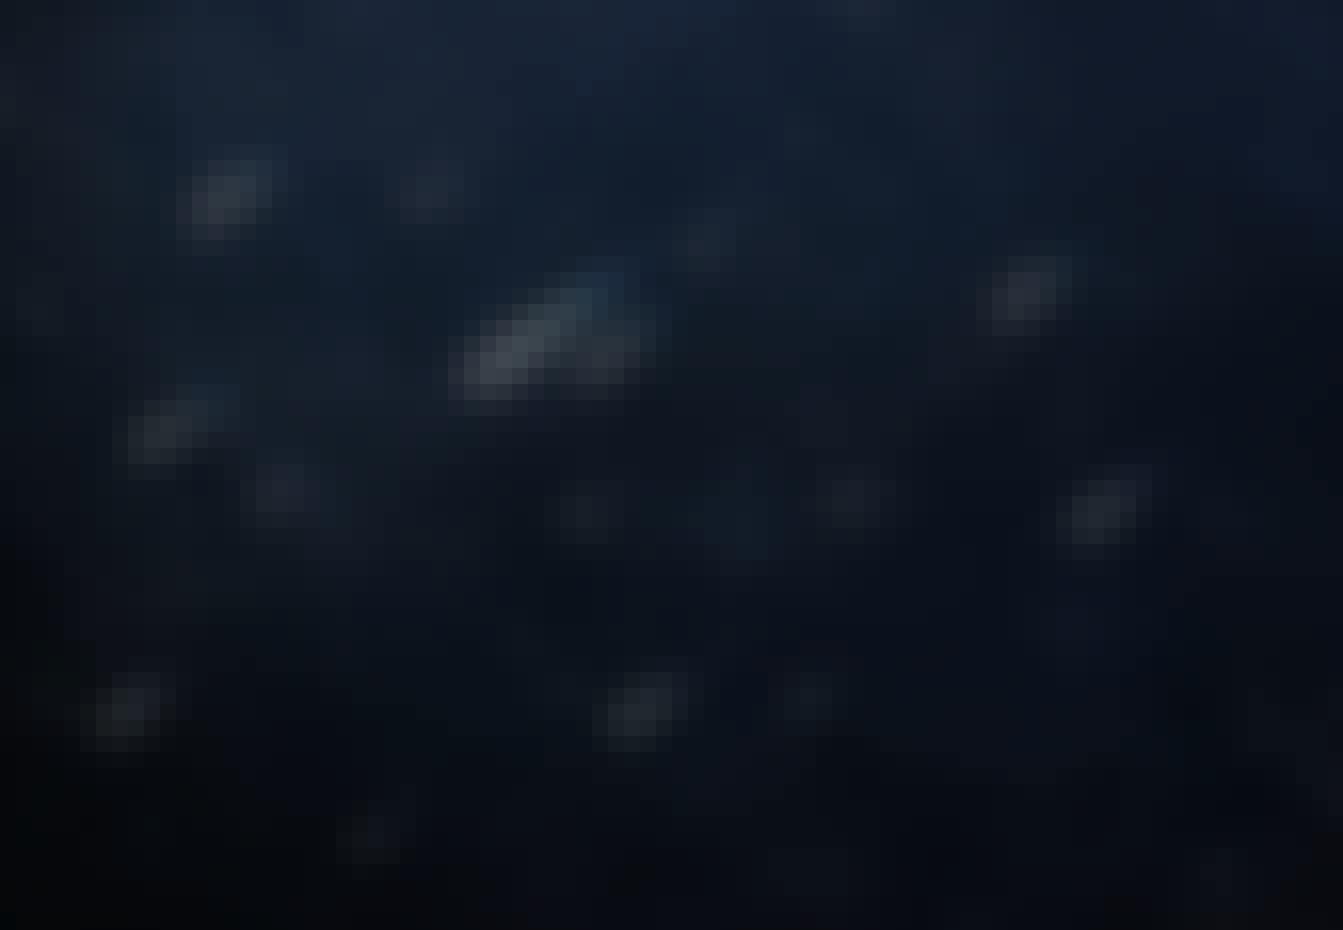 Asteroider flyr forbi jorden